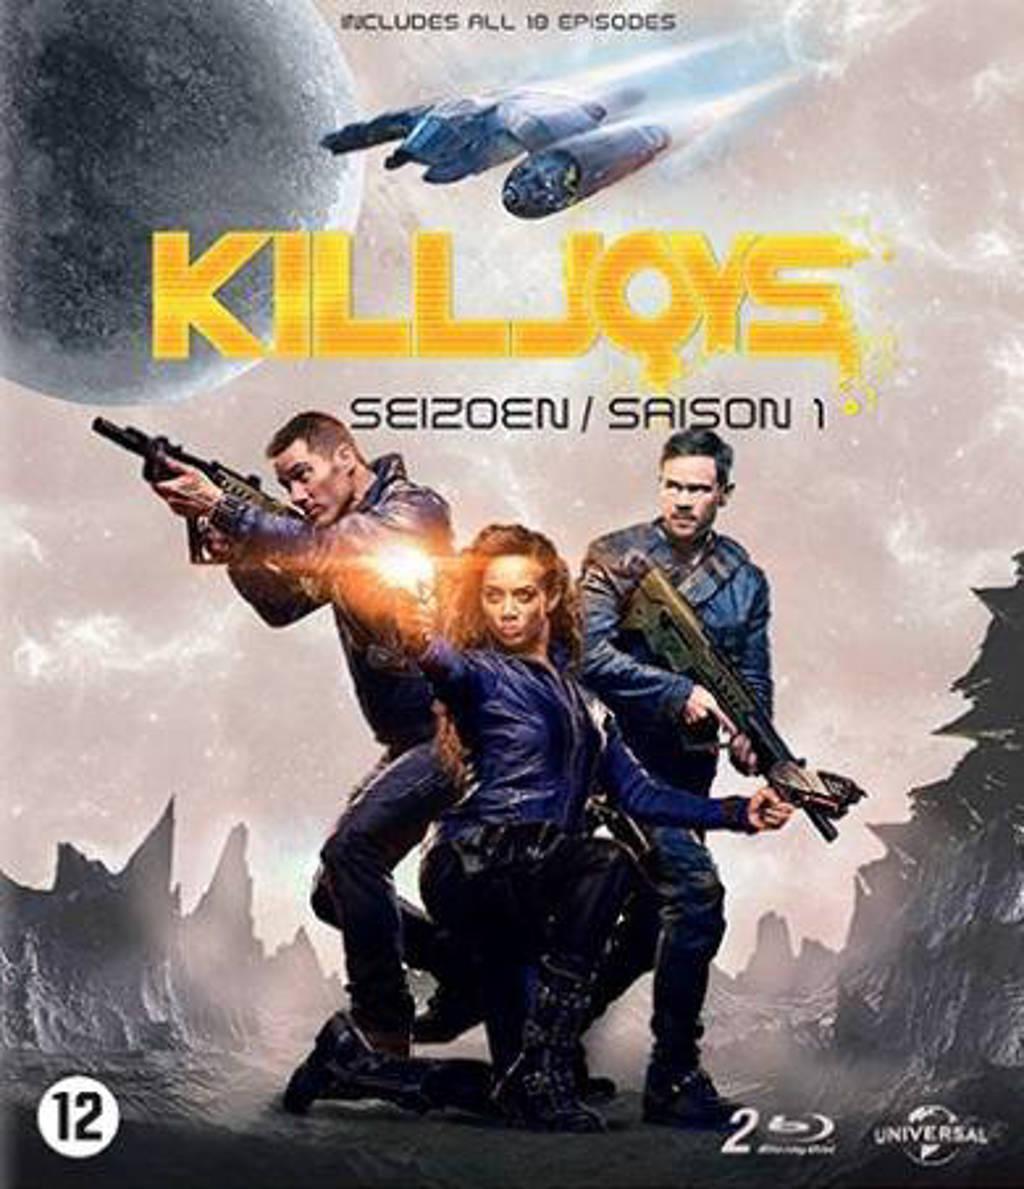 Killjoys - Seizoen 1 (Blu-ray)